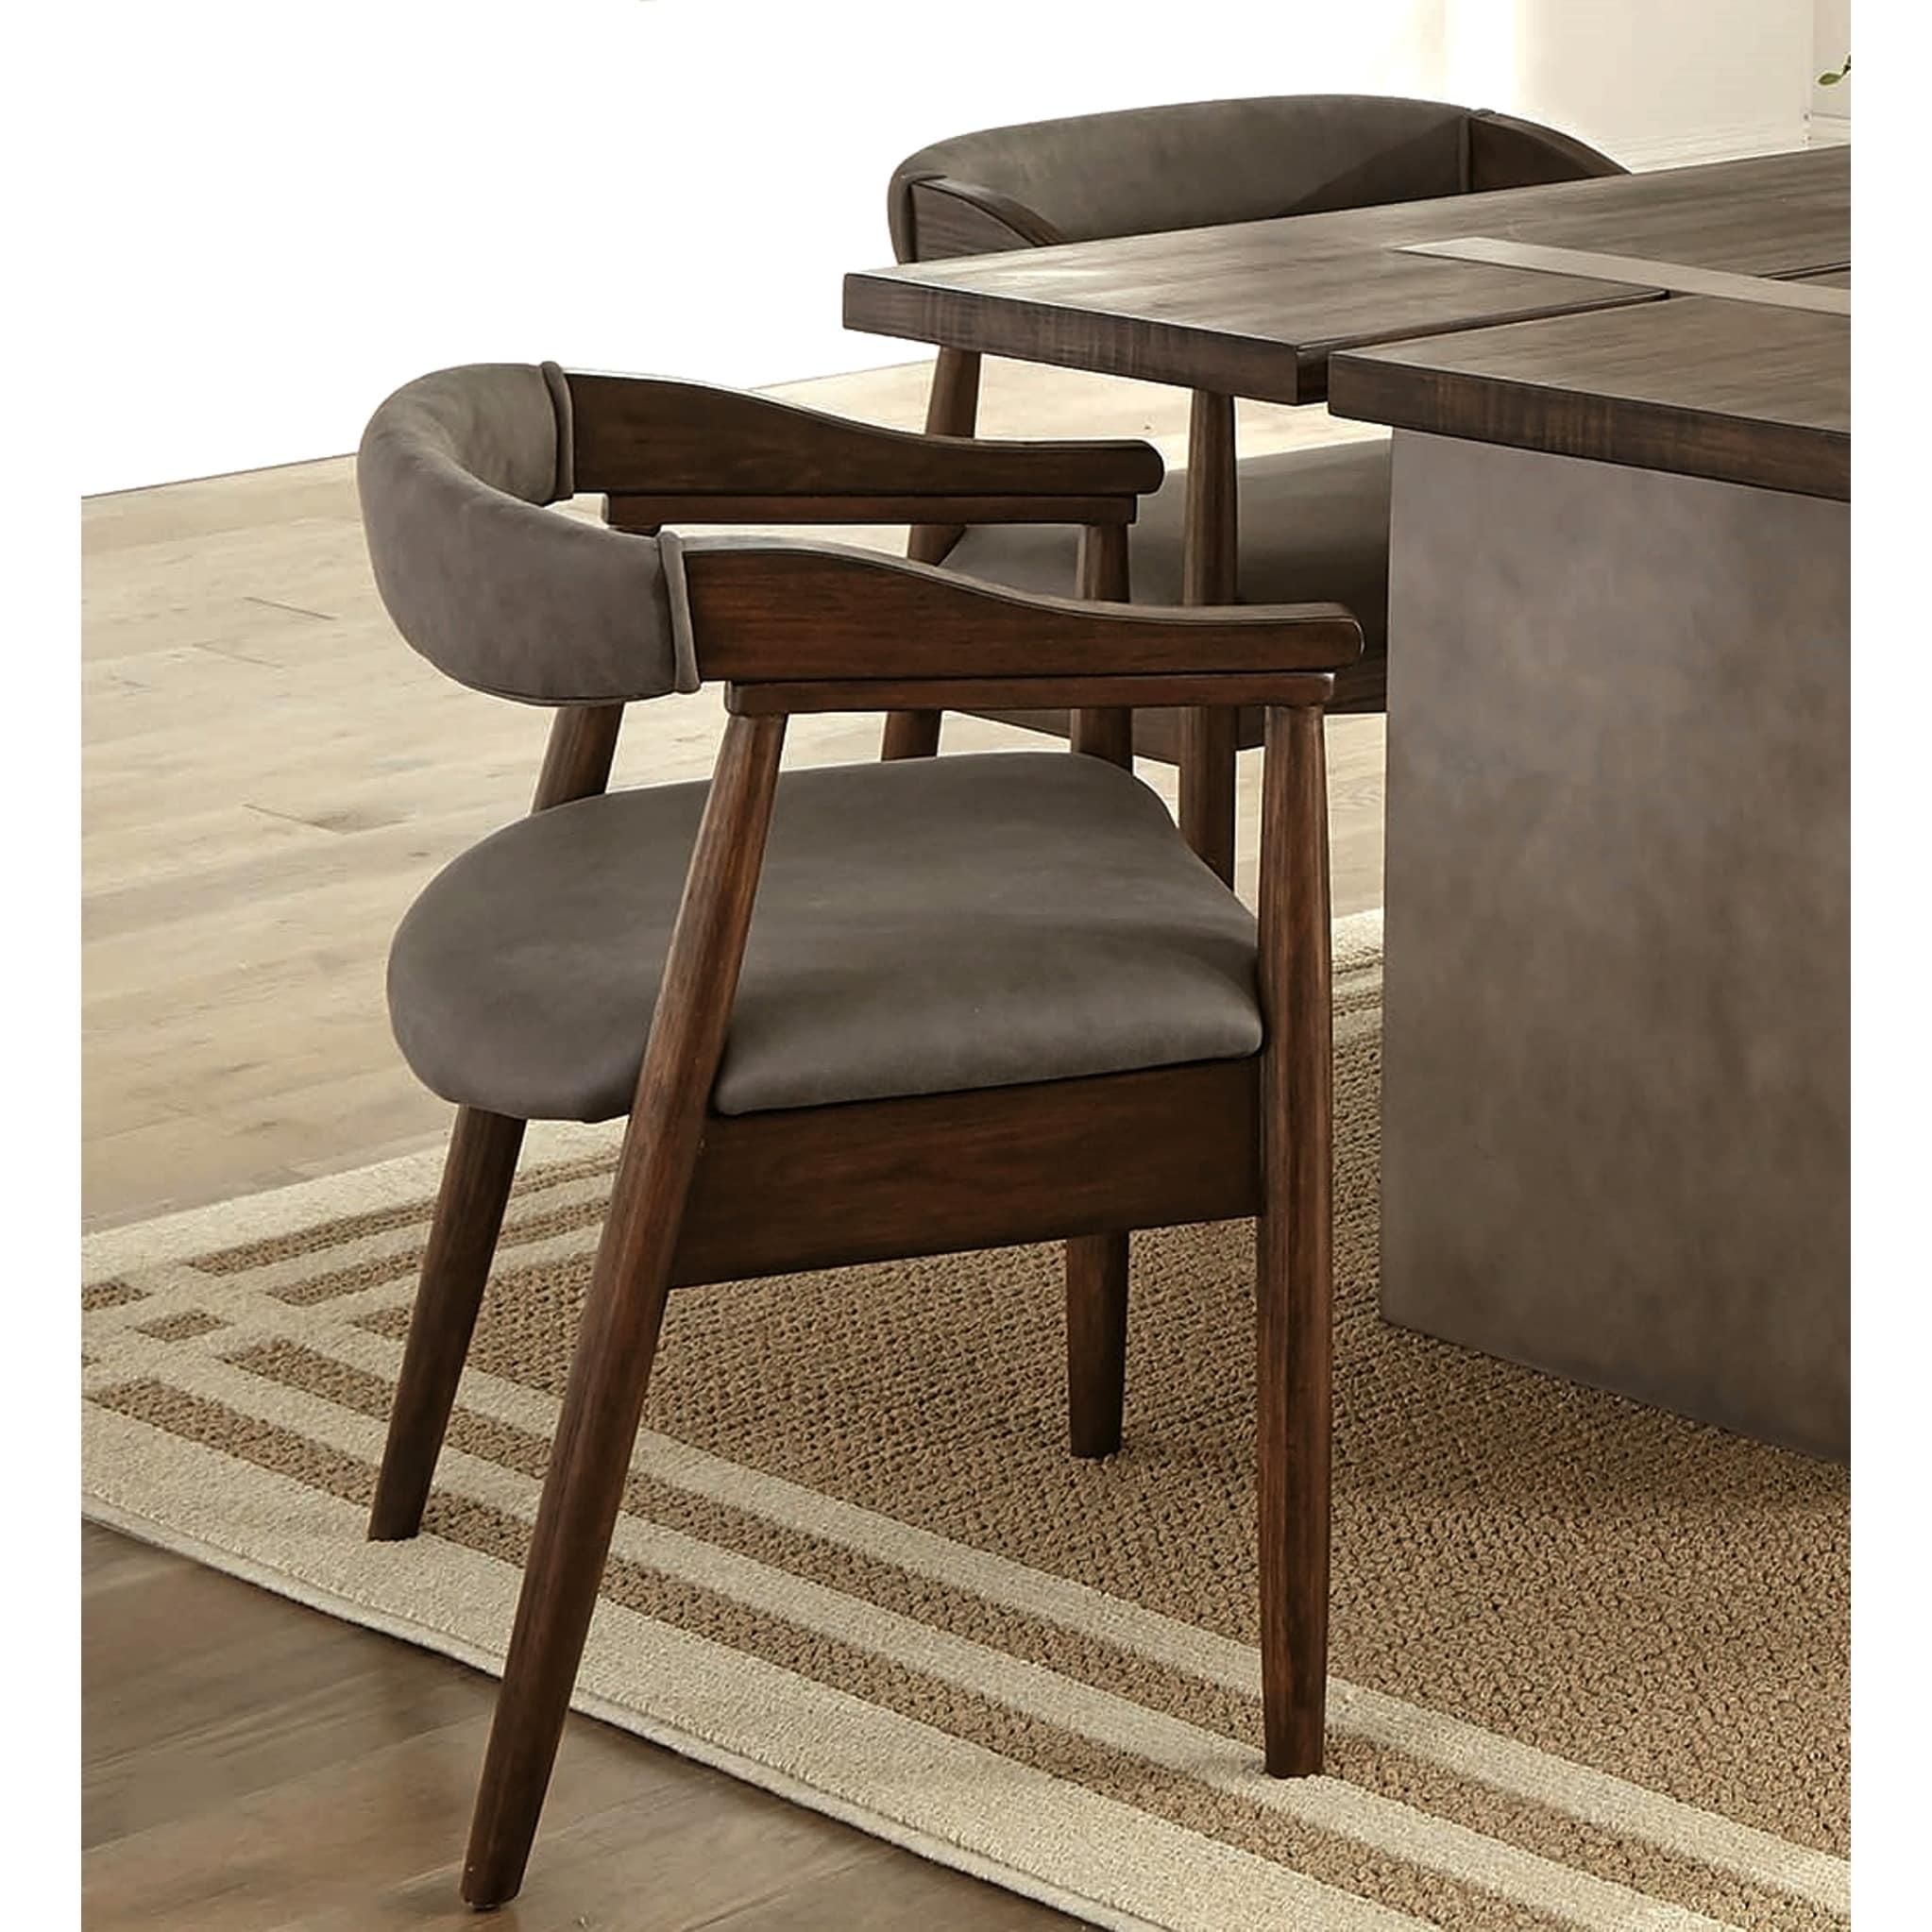 Mid Century Modern Danish Design Dining Arm Chairs Set Of 2